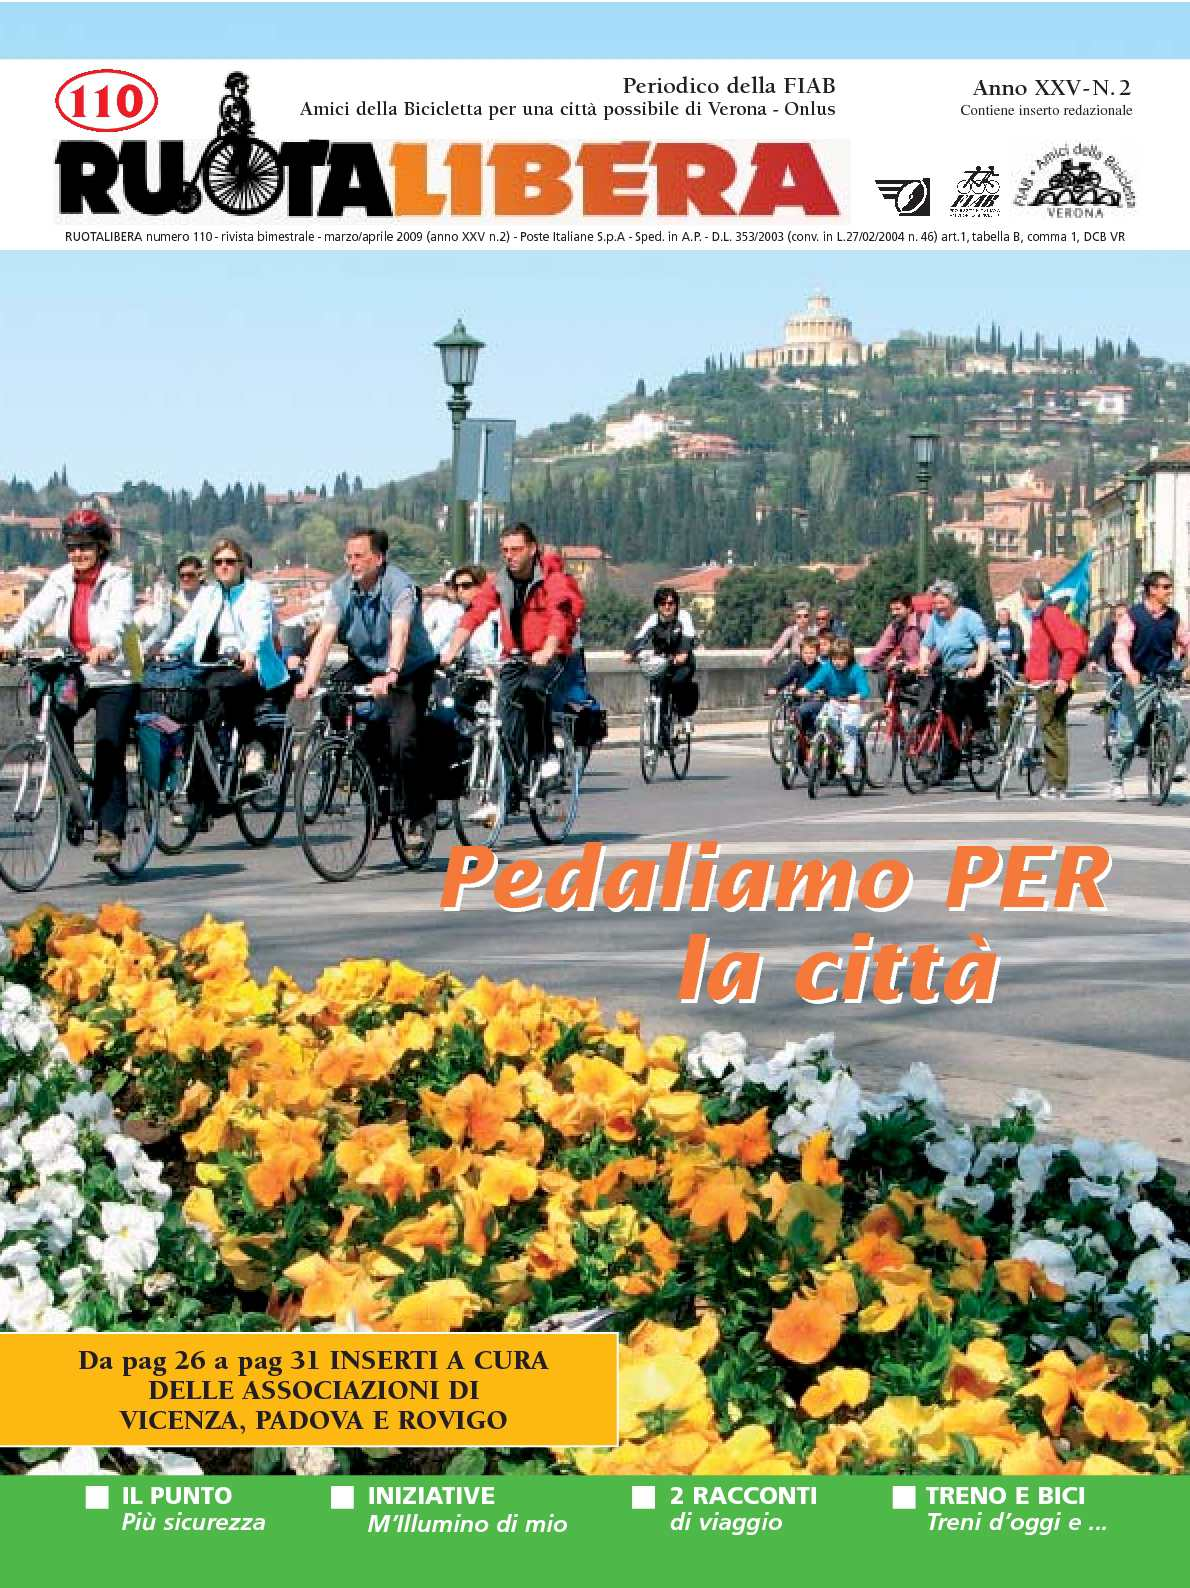 Ruotalibera 110 (marzo/aprile 2009) - FIAB AdB Verona